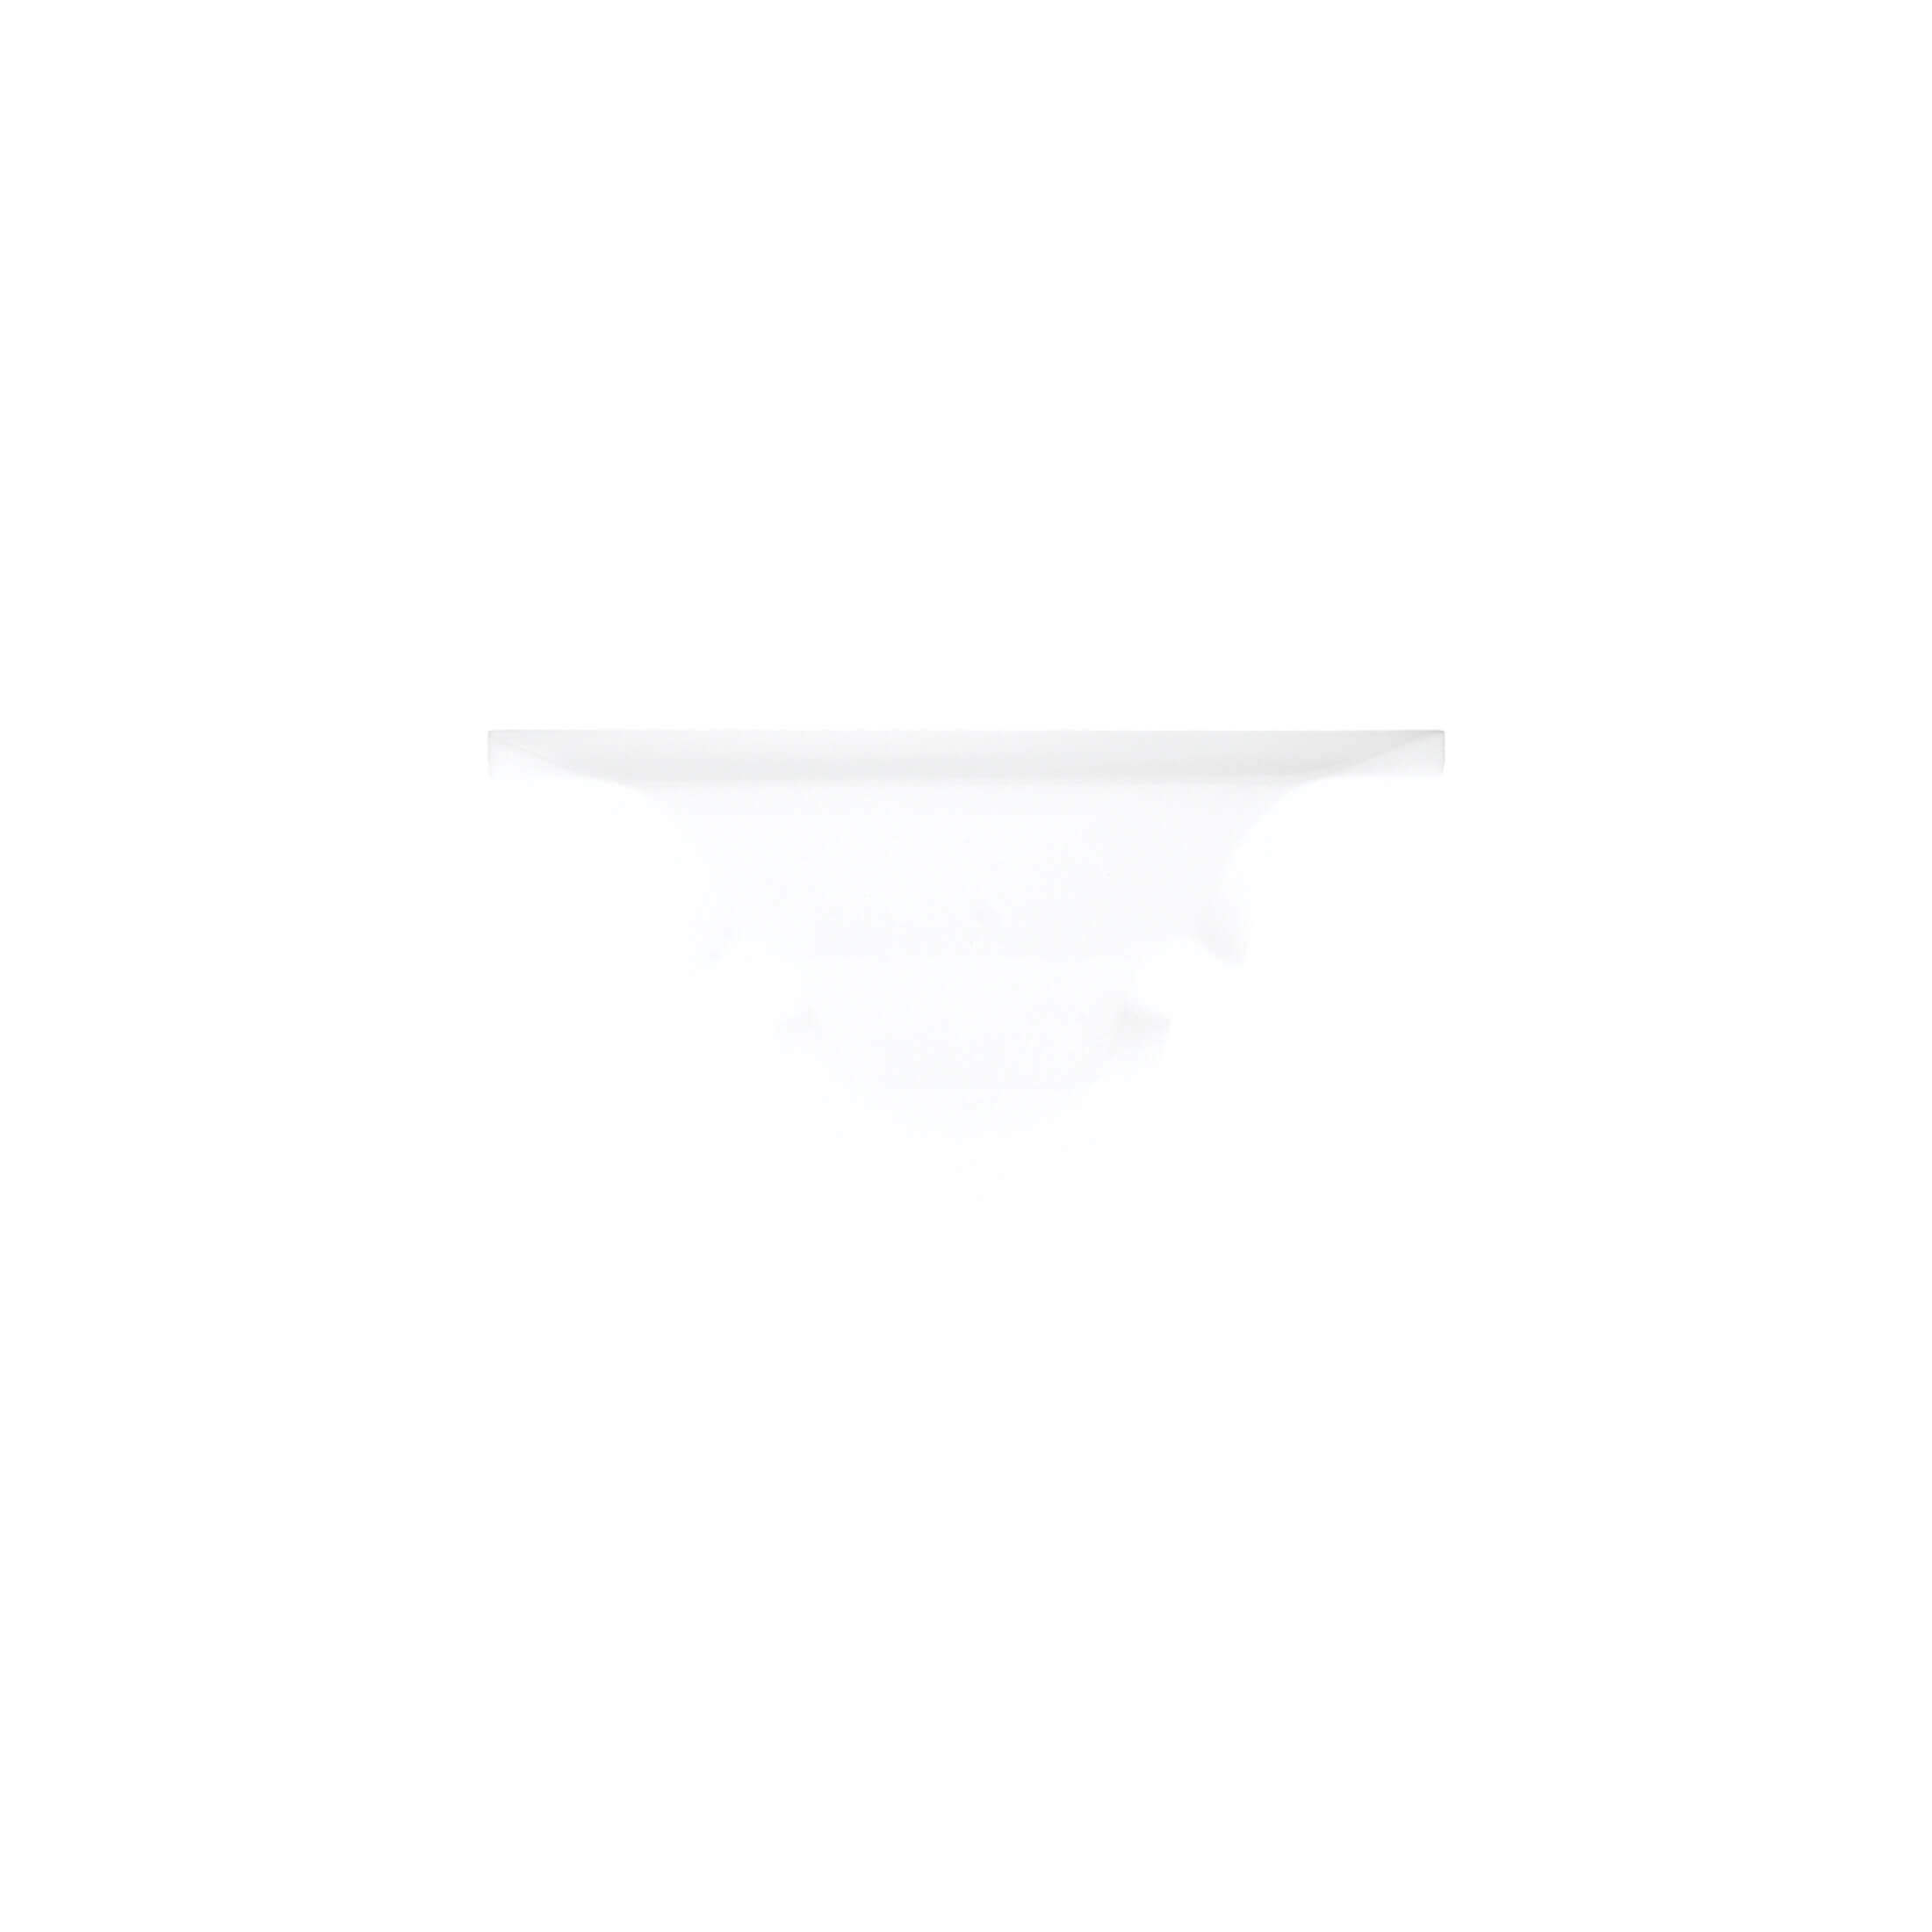 ADEX-ADST8008-ARABESCO-REMATE SNOW CAP-7.5 cm-15 cm-RENAISSANCE>BISELADO